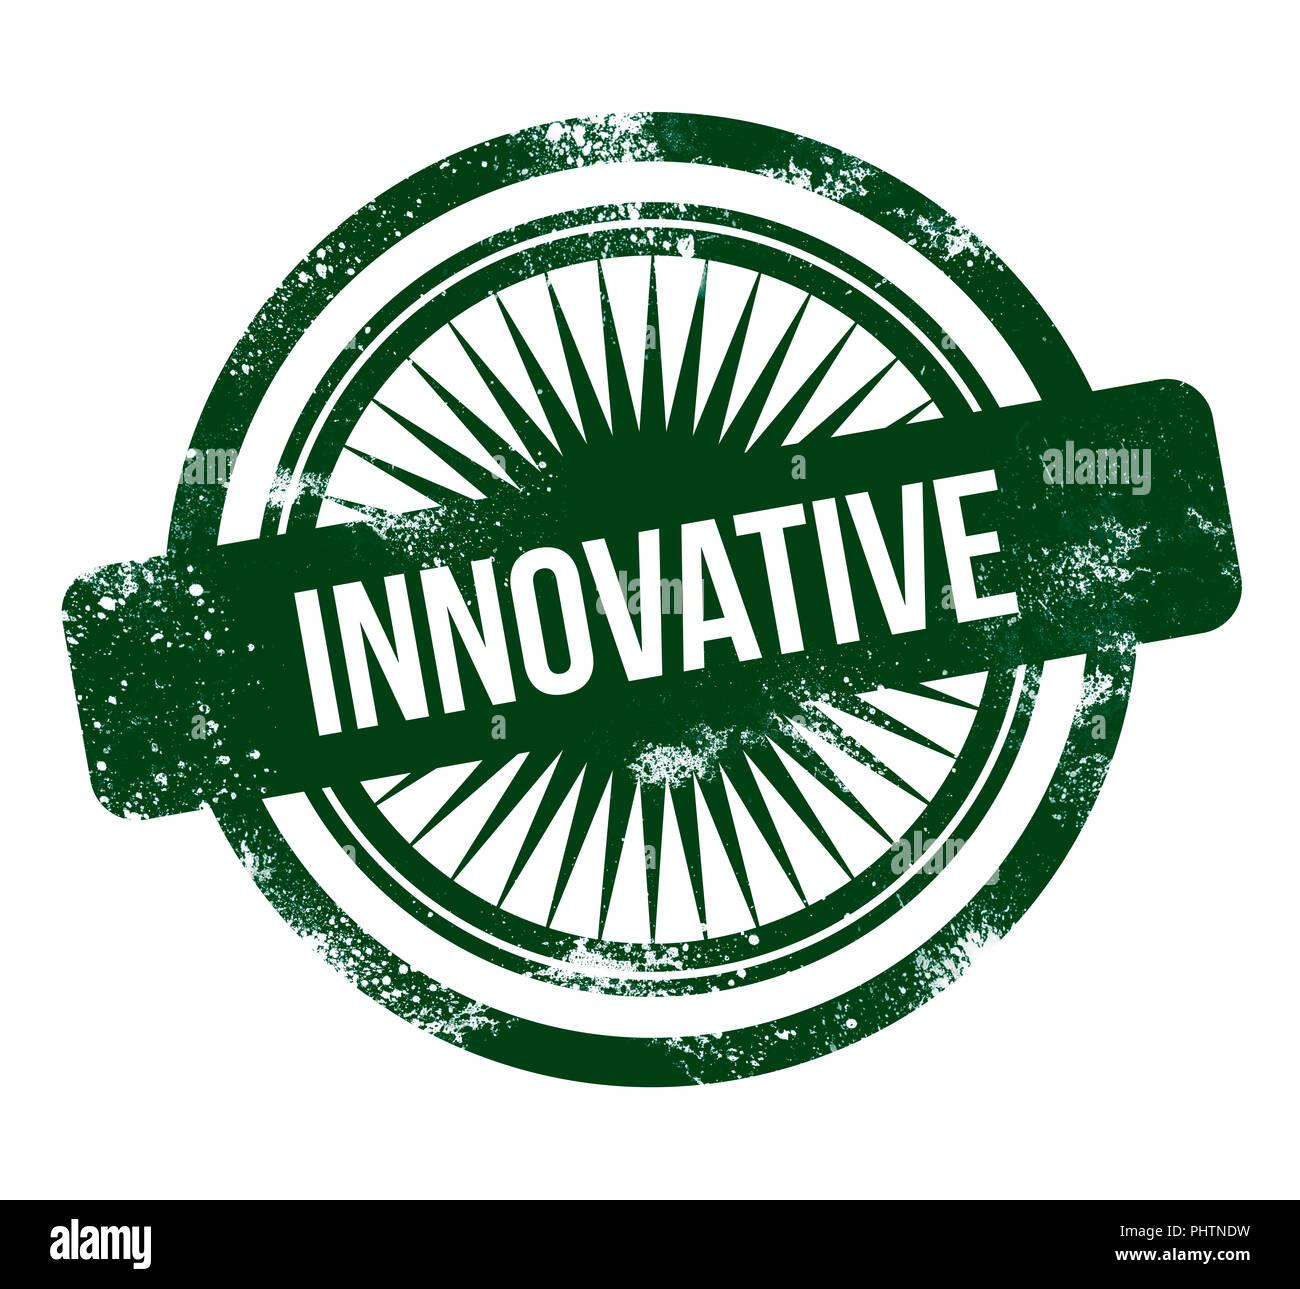 Innovativi - green grunge timbro Immagini Stock